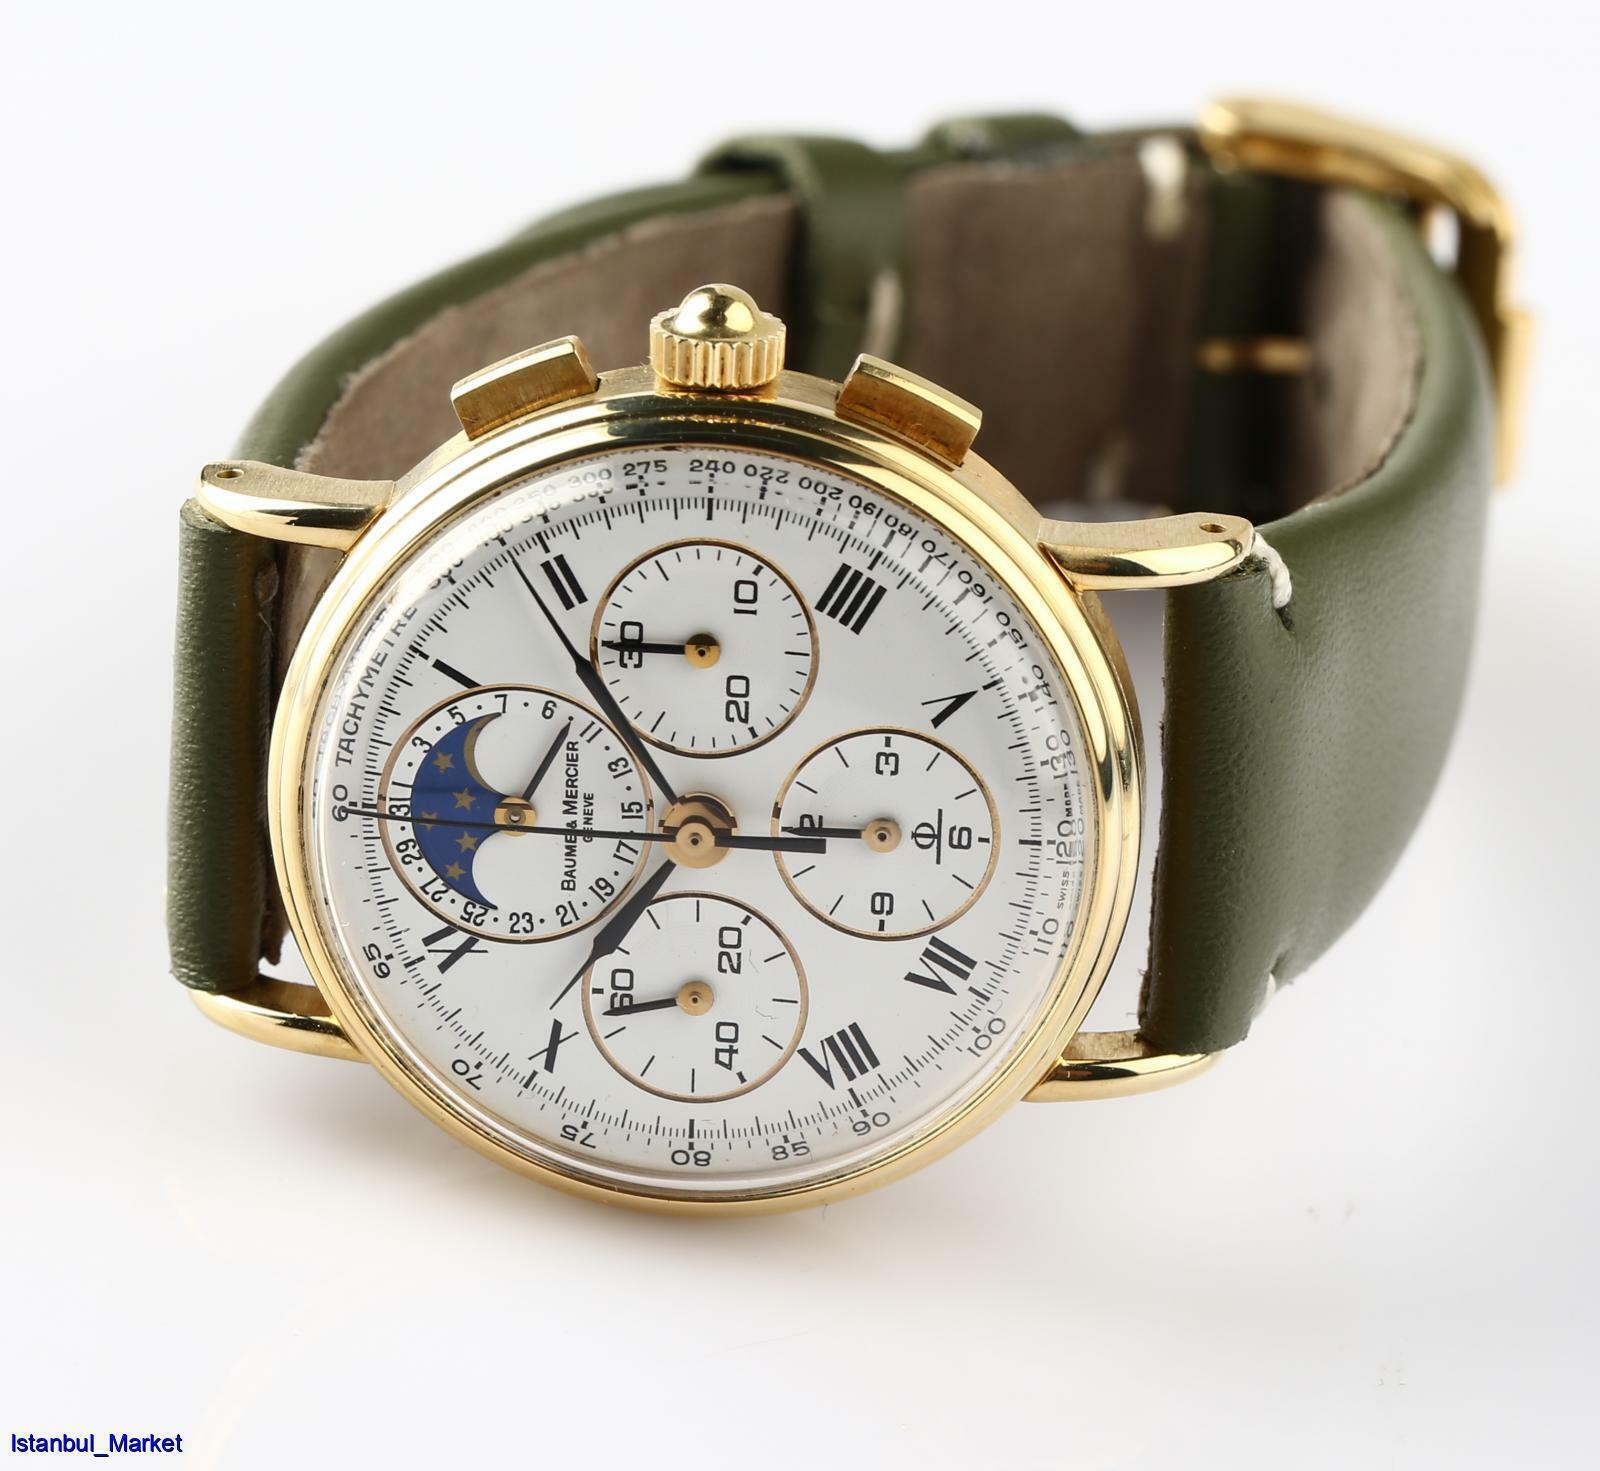 Vintage Baume Mercier Ref 6102099 18k Yellow Gold Chronograph Unisex Wristwatch - watch picture 1